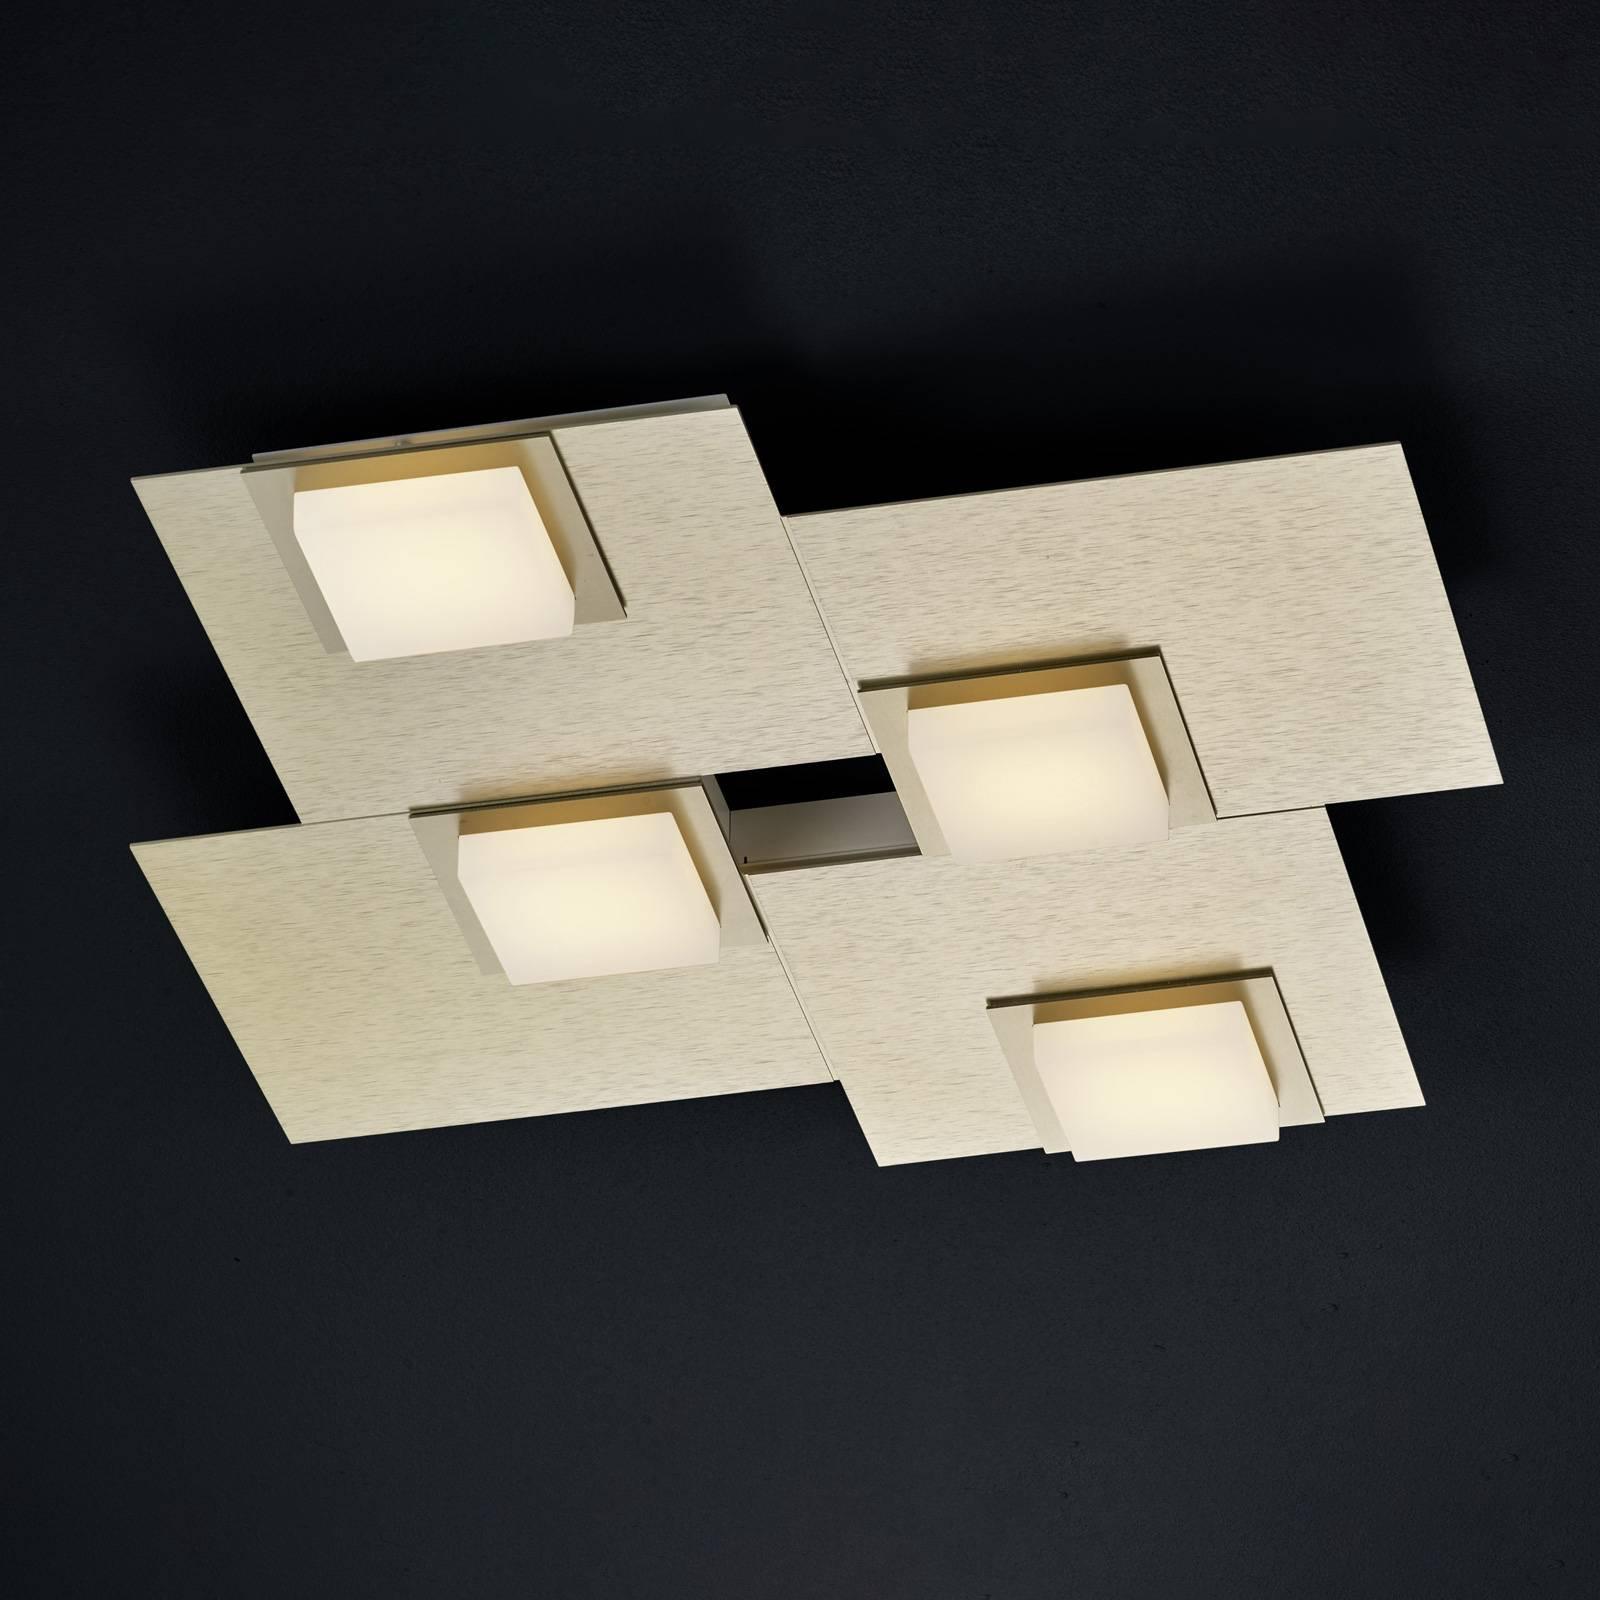 BANKAMP New Quadro plafondlamp 4-lamps champagne